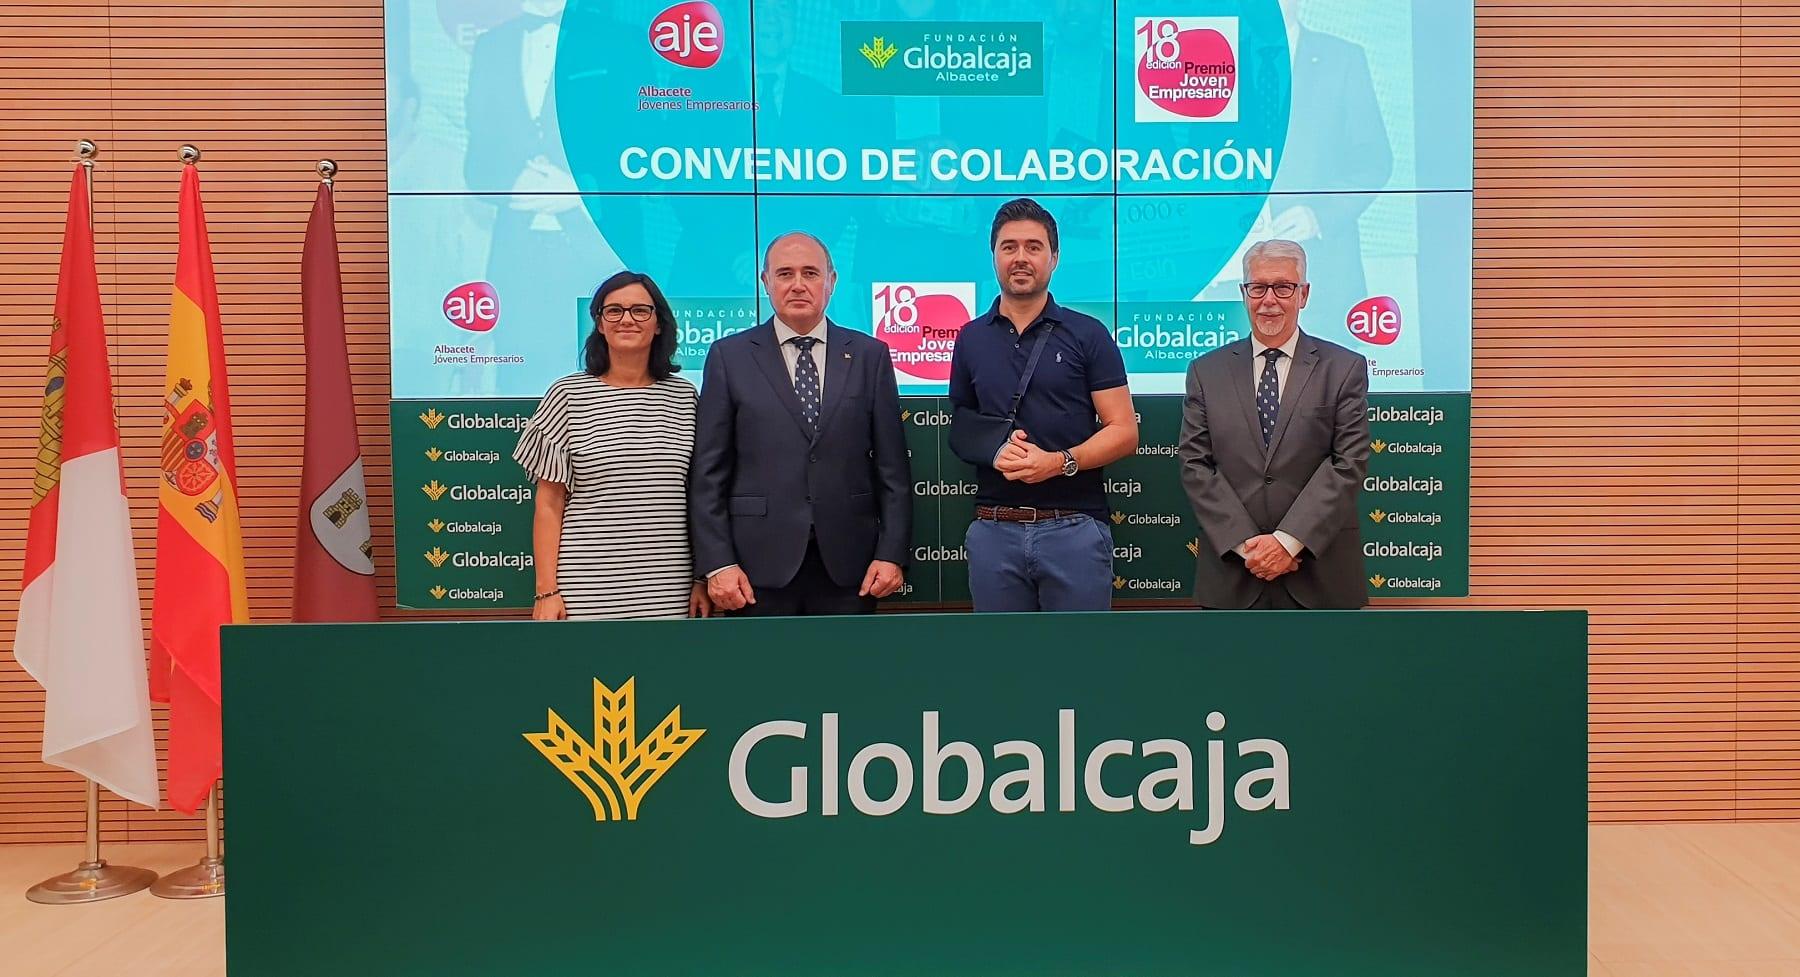 https://blog.globalcaja.es/wp-content/uploads/2019/09/foto-3-firma-de-convenio-AJE2019.jpg